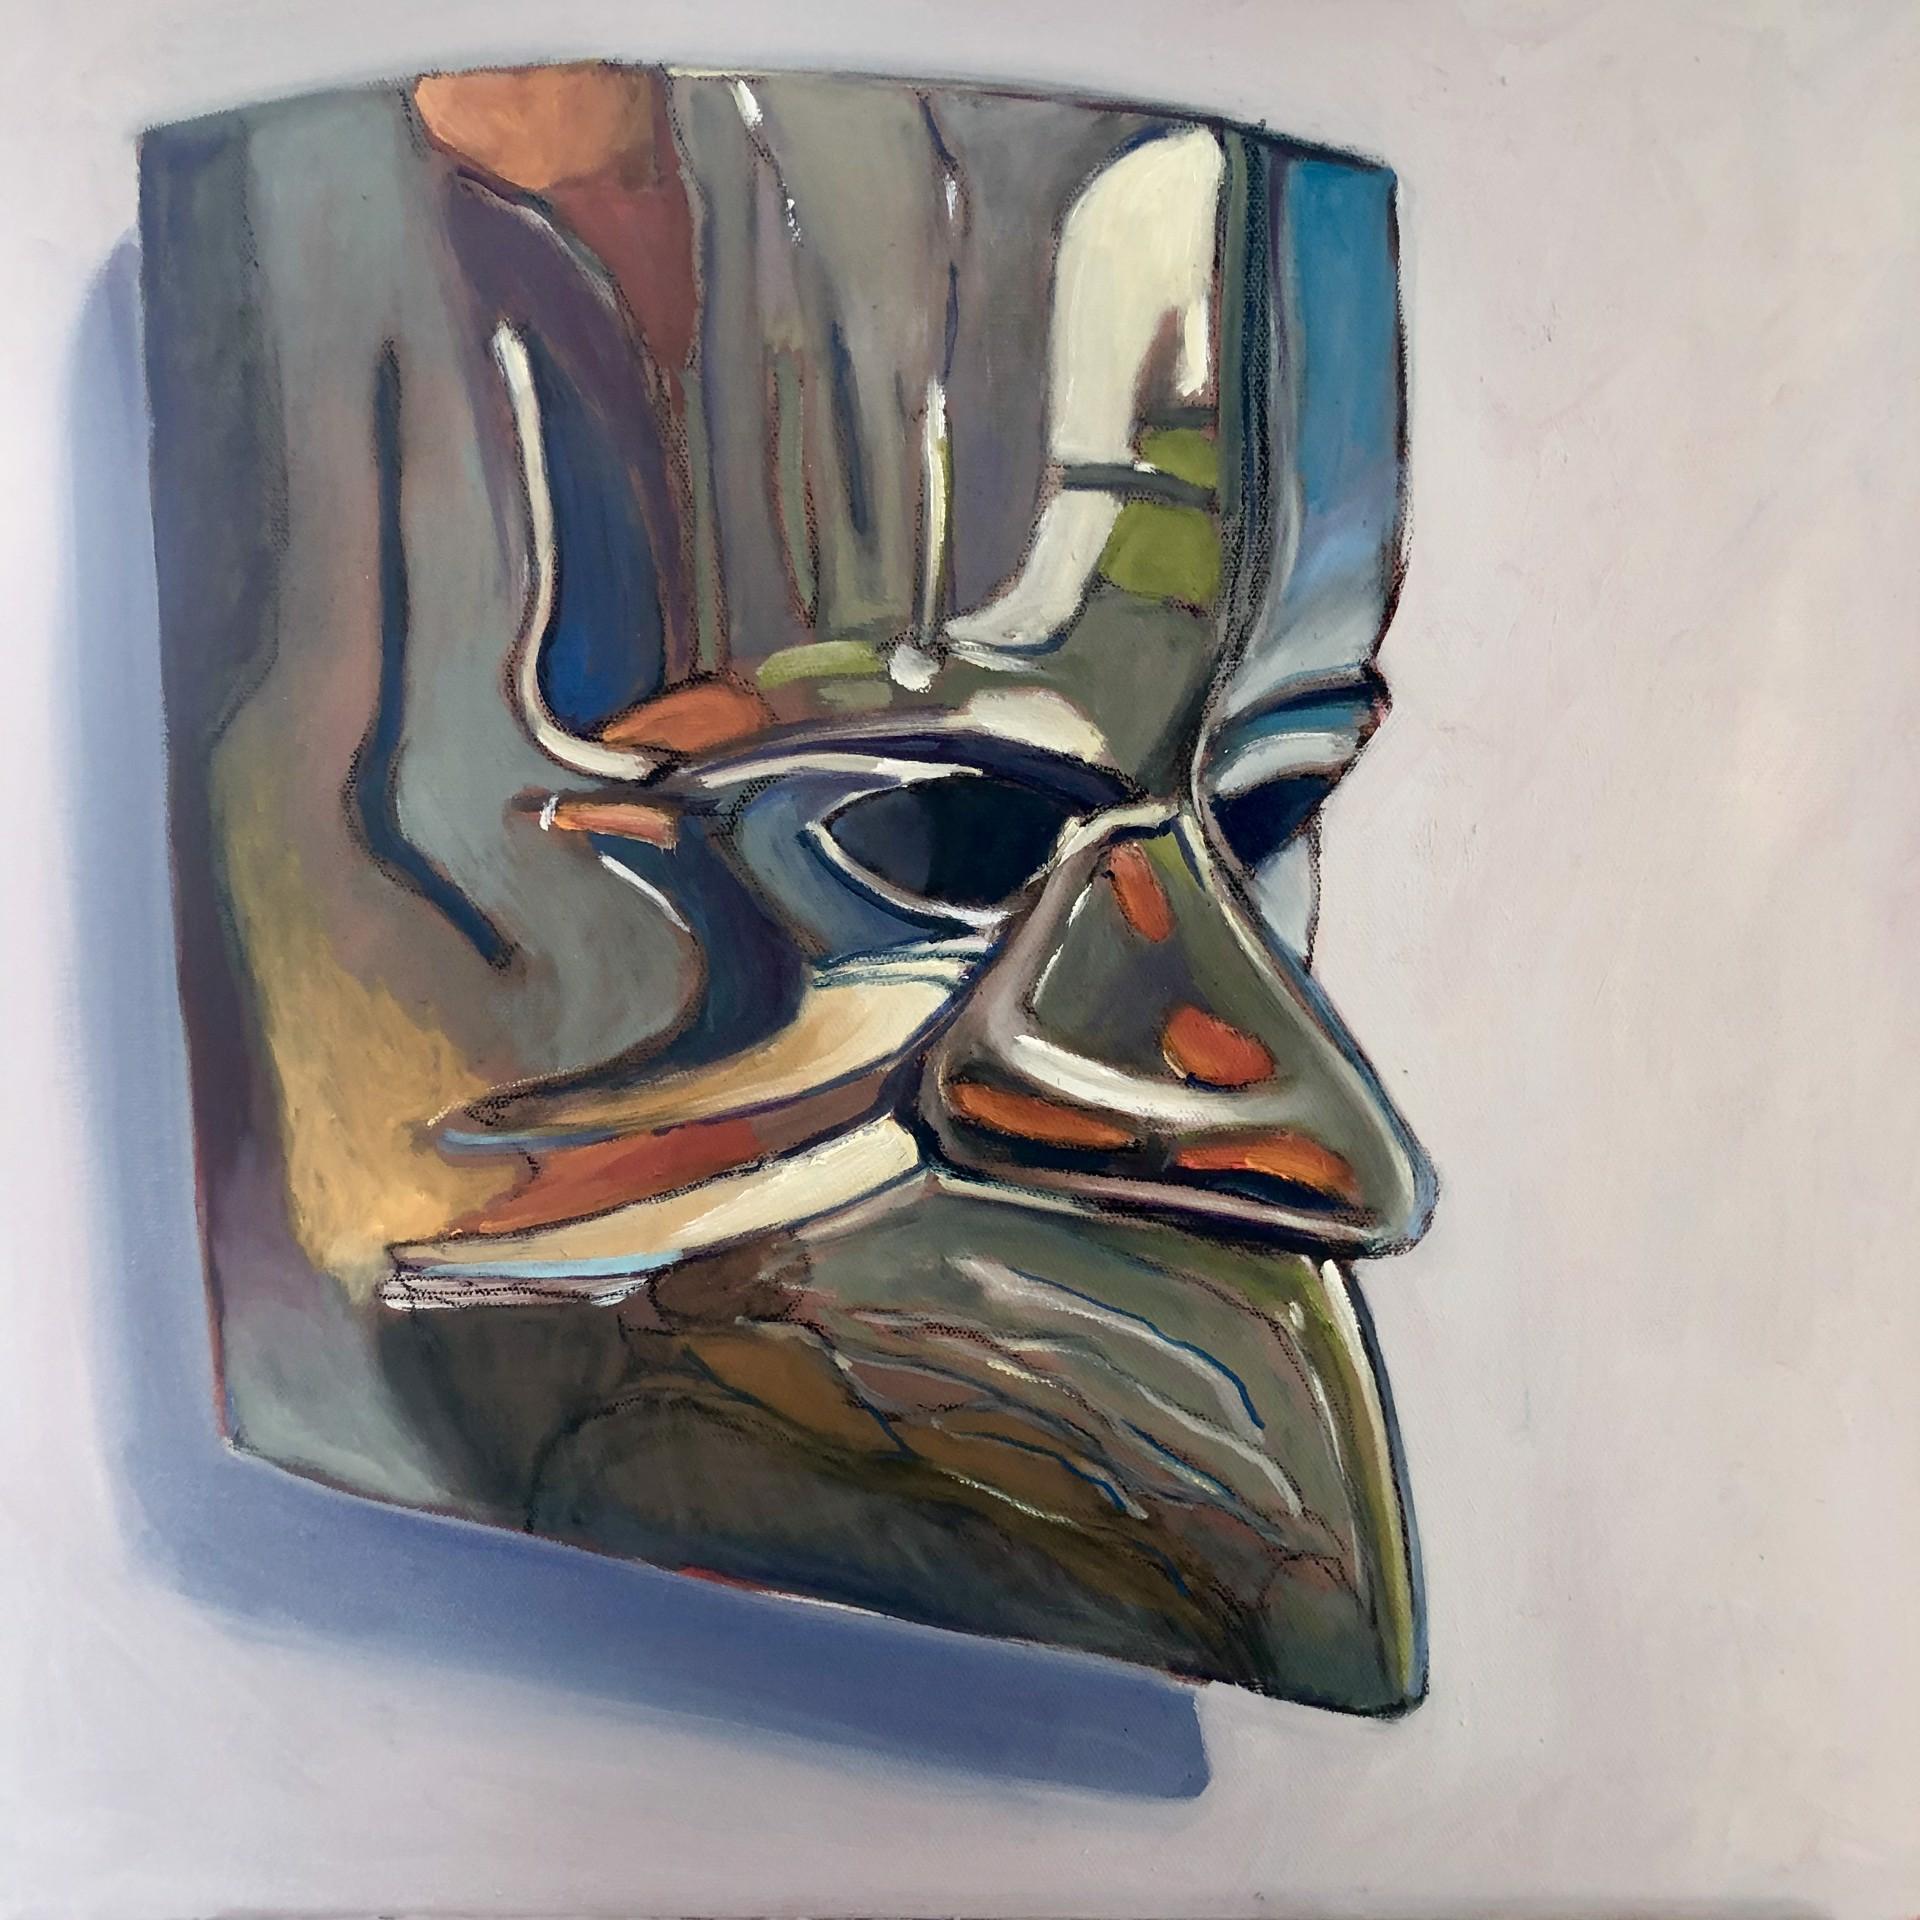 The Mask by Maurizio Maso